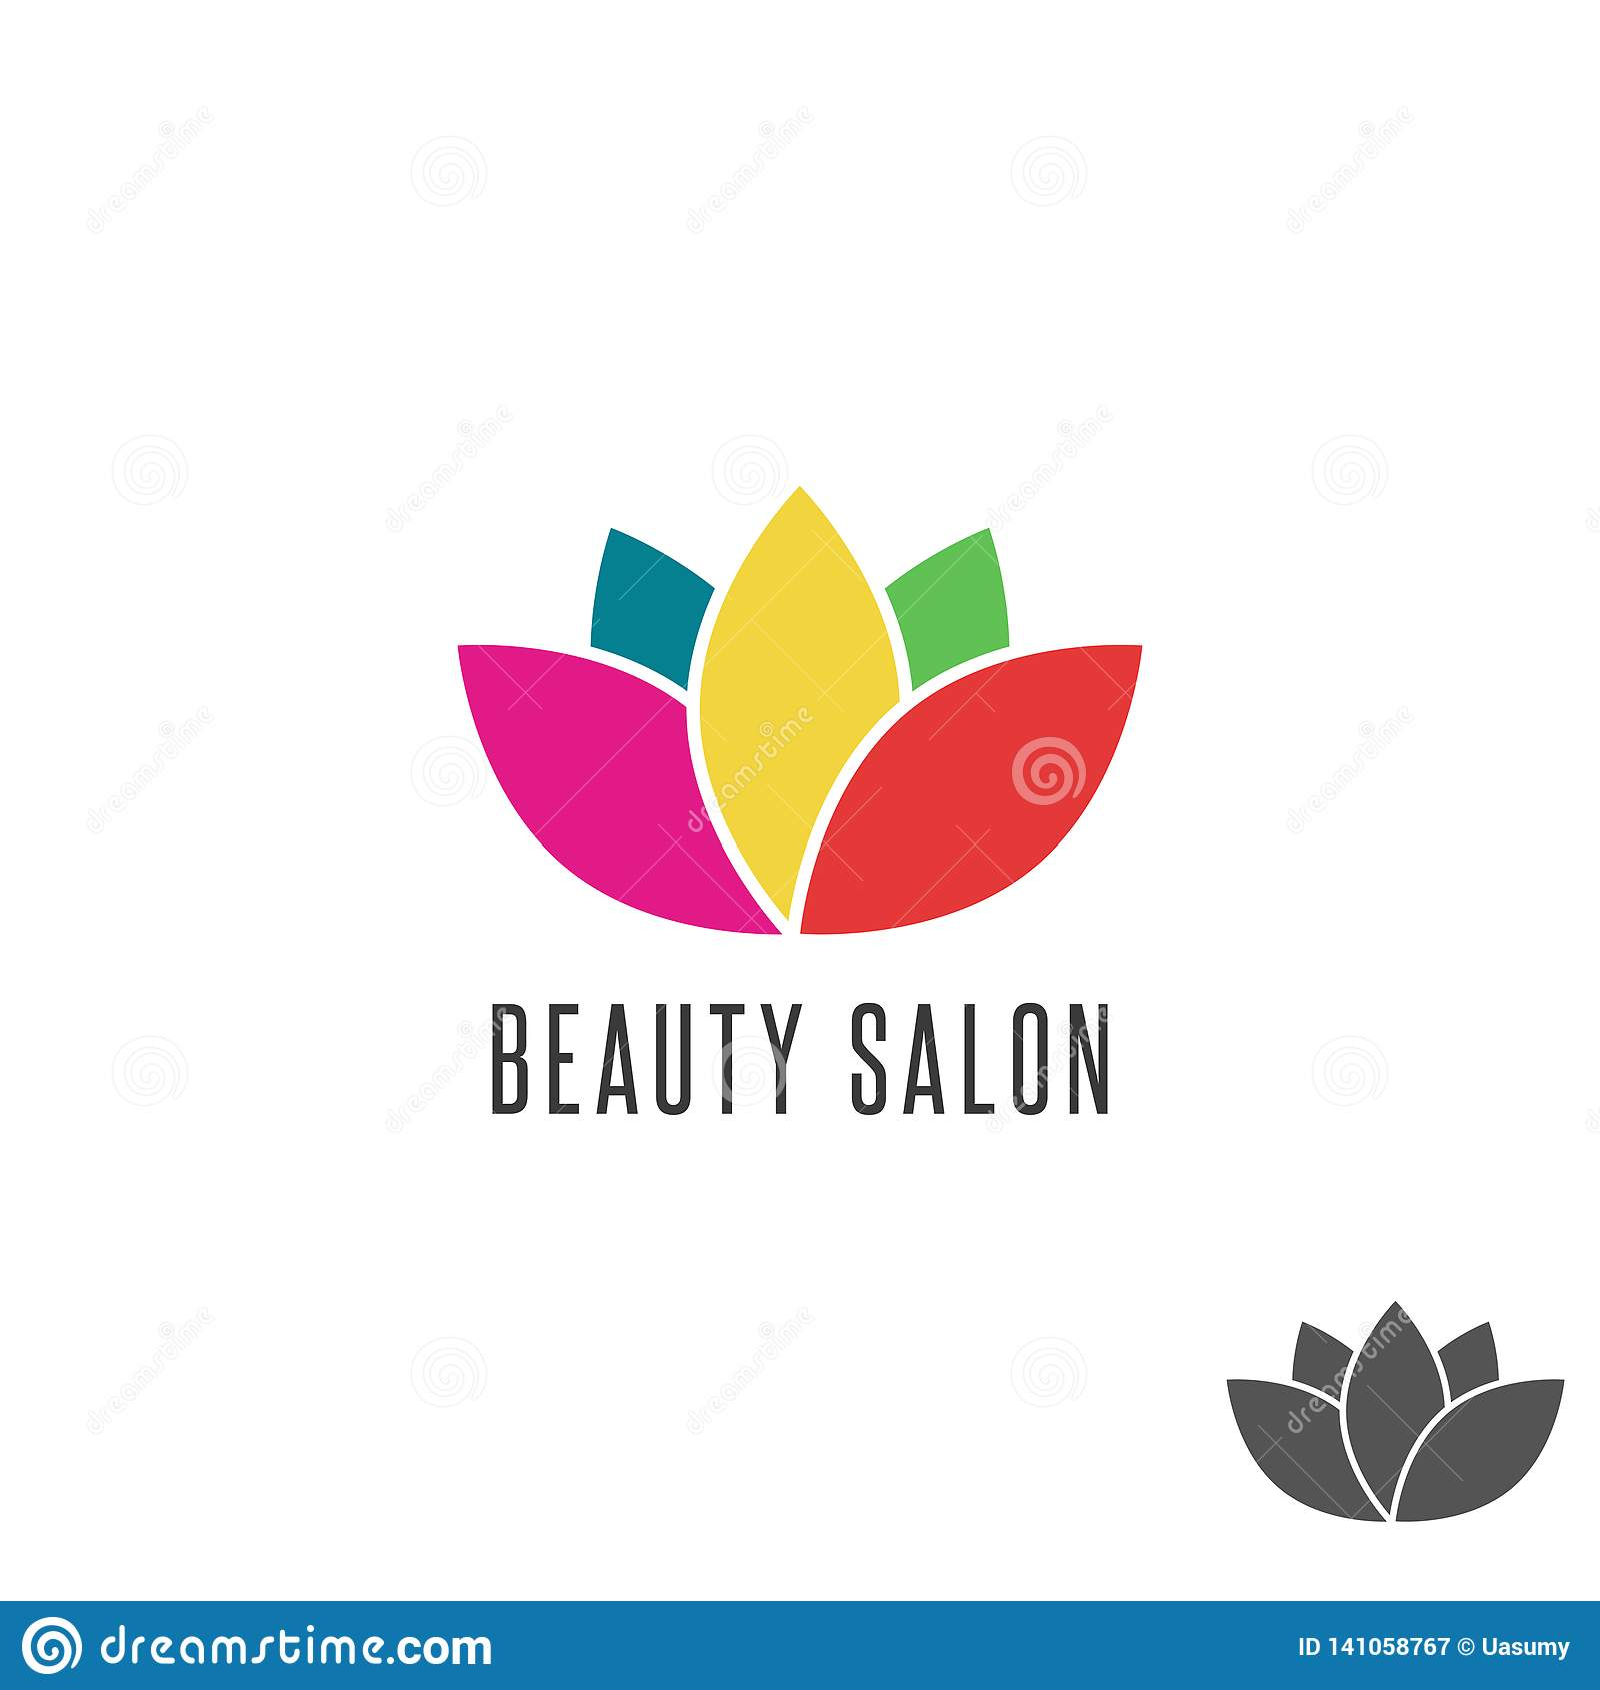 Lotus logo flower colorful beauty salon emblem mockup, floral oriental abstract sign yoga